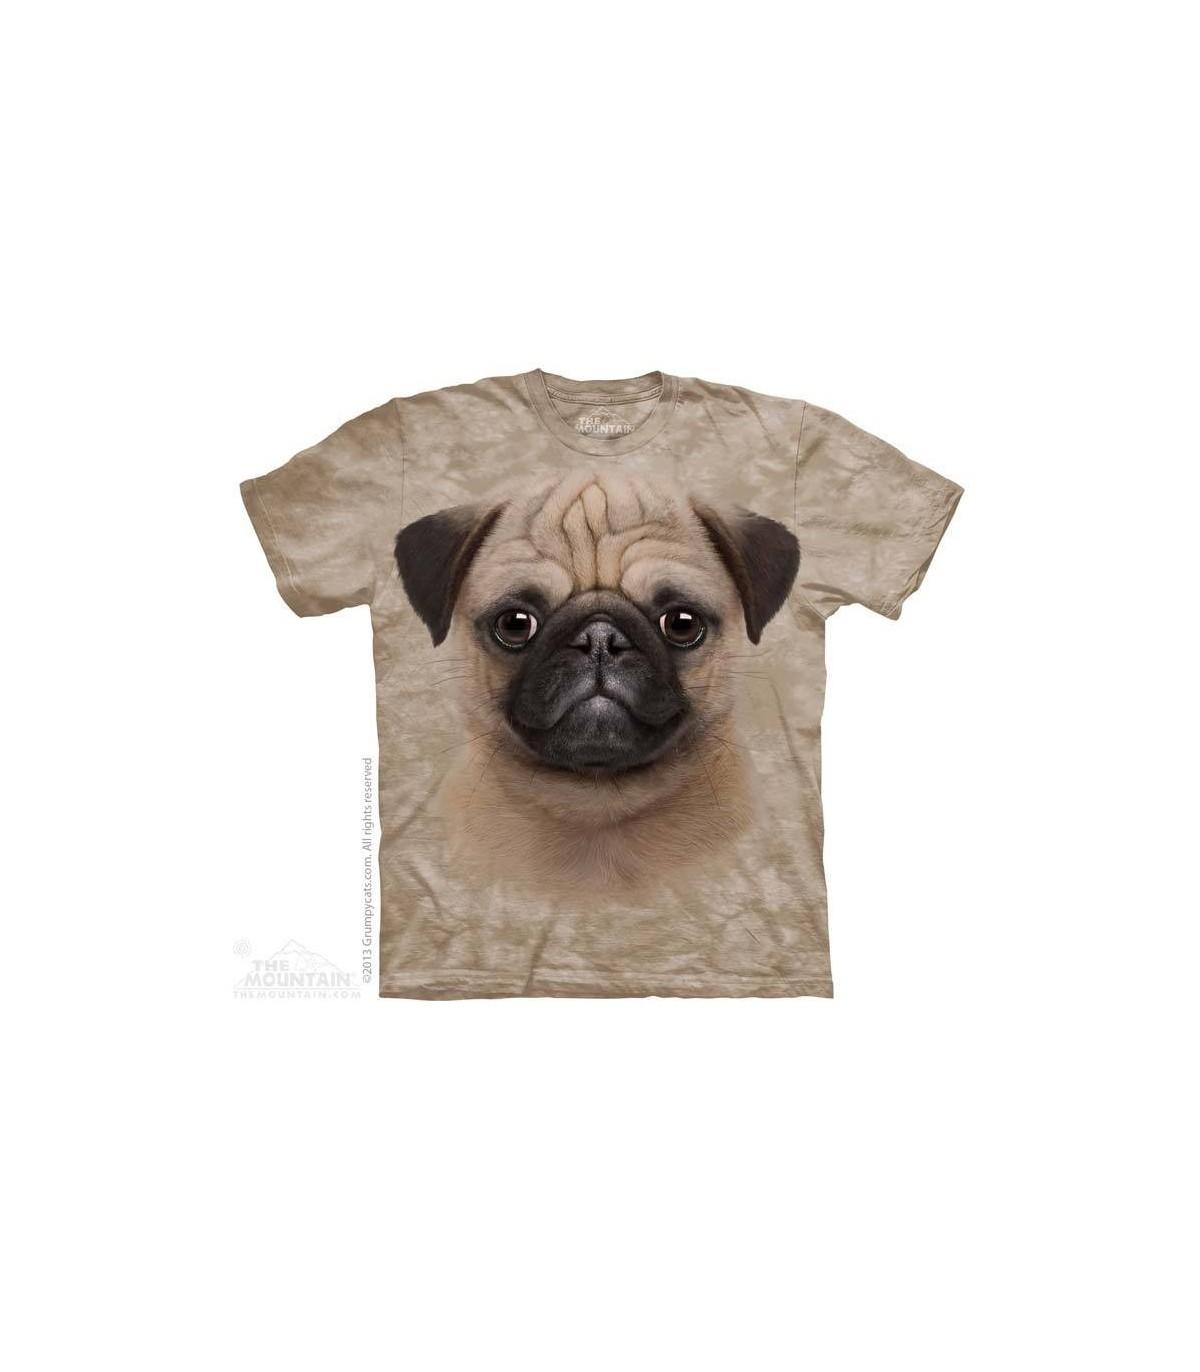 c974194973bbe Pug Puppy - Dog T Shirt The Mountain